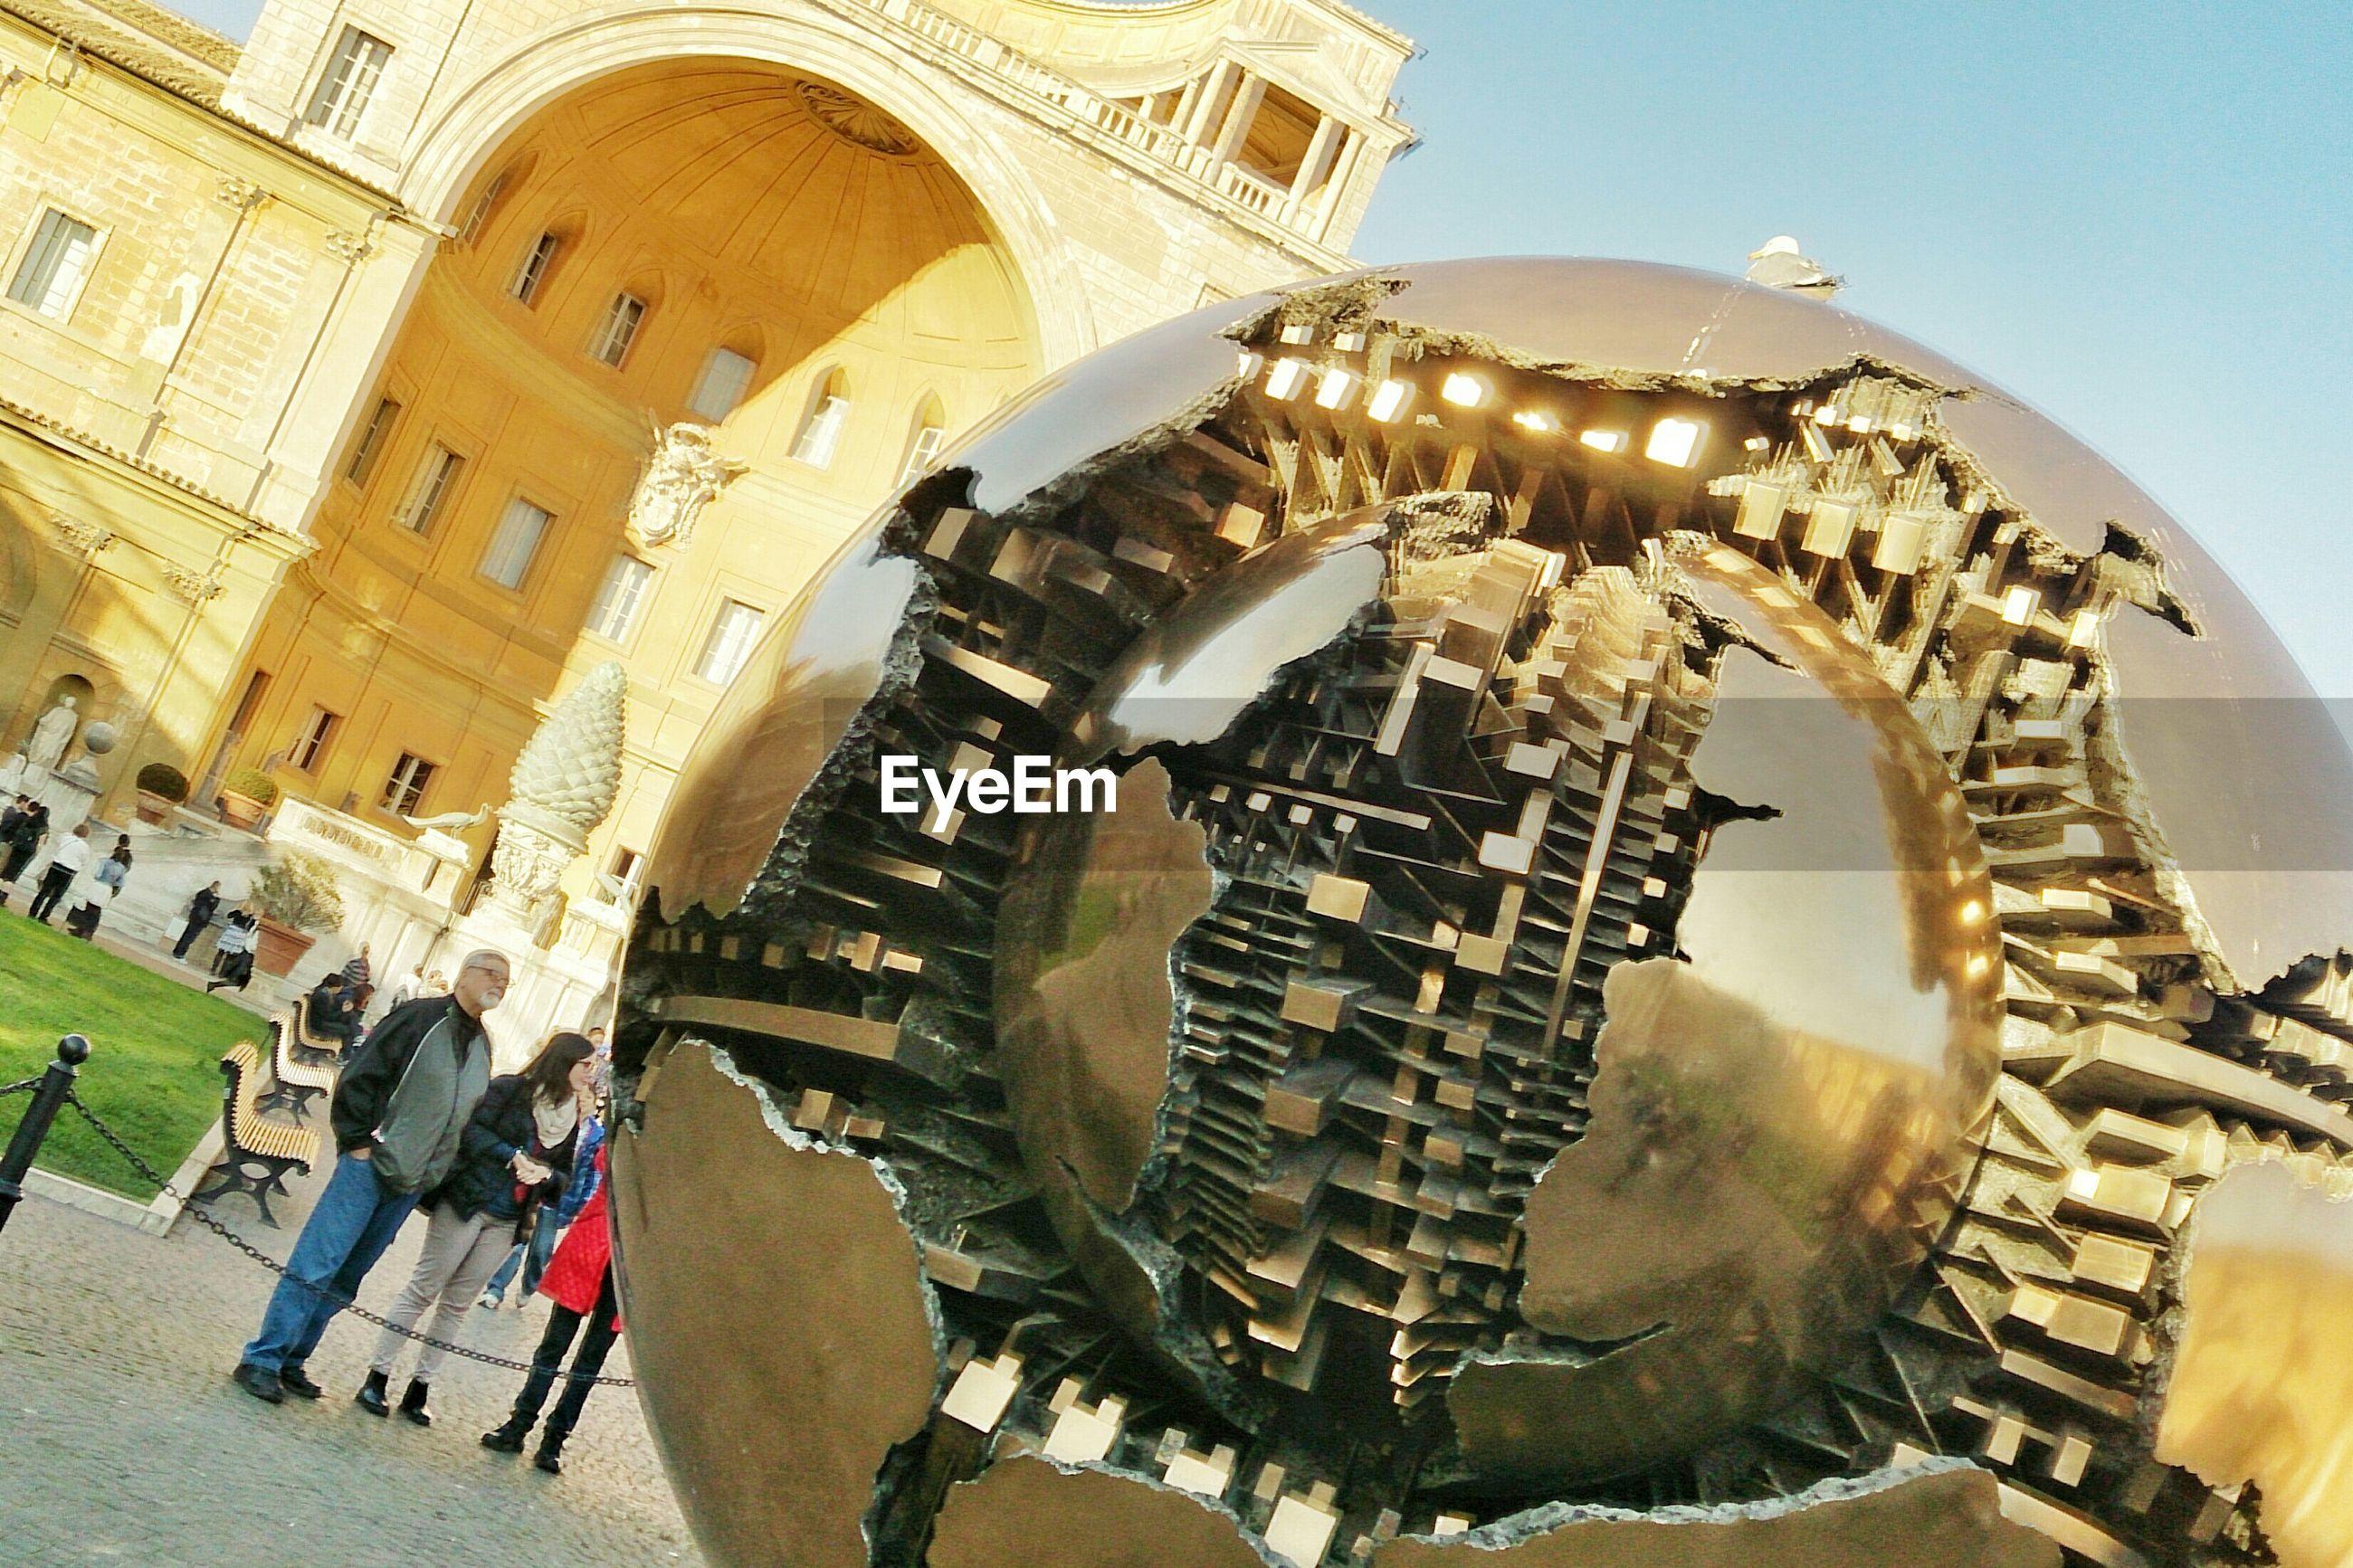 Futuristic monument on town square